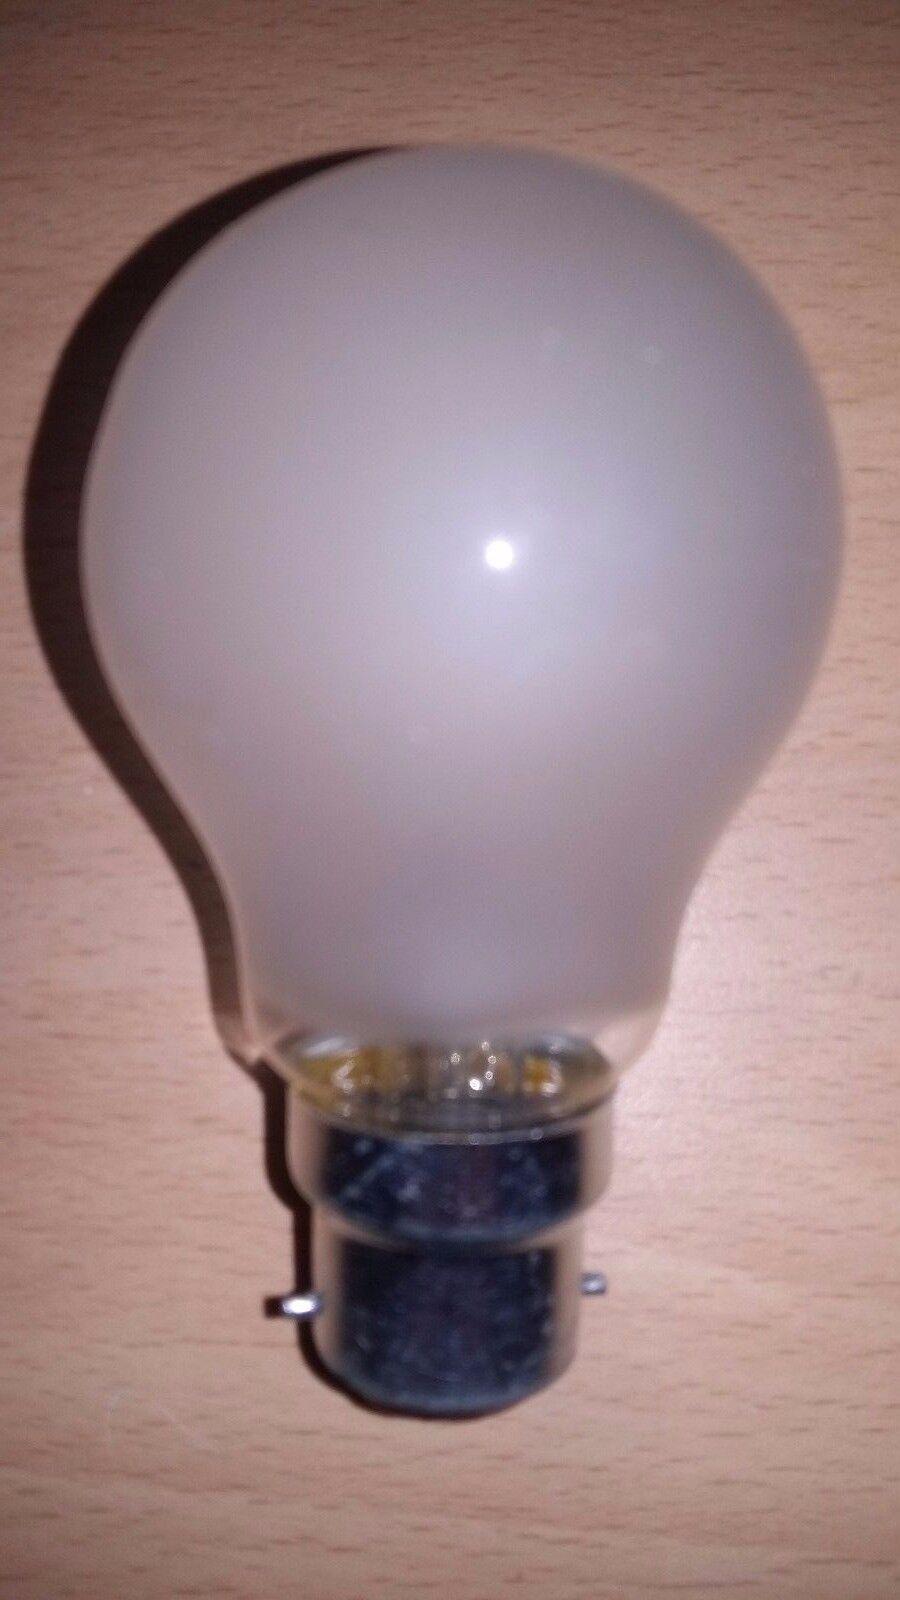 50 x 75w Frosted Pearl Opal GLS Light Bulb Lamp BC Bayonet Cap B22 Push In Bulb